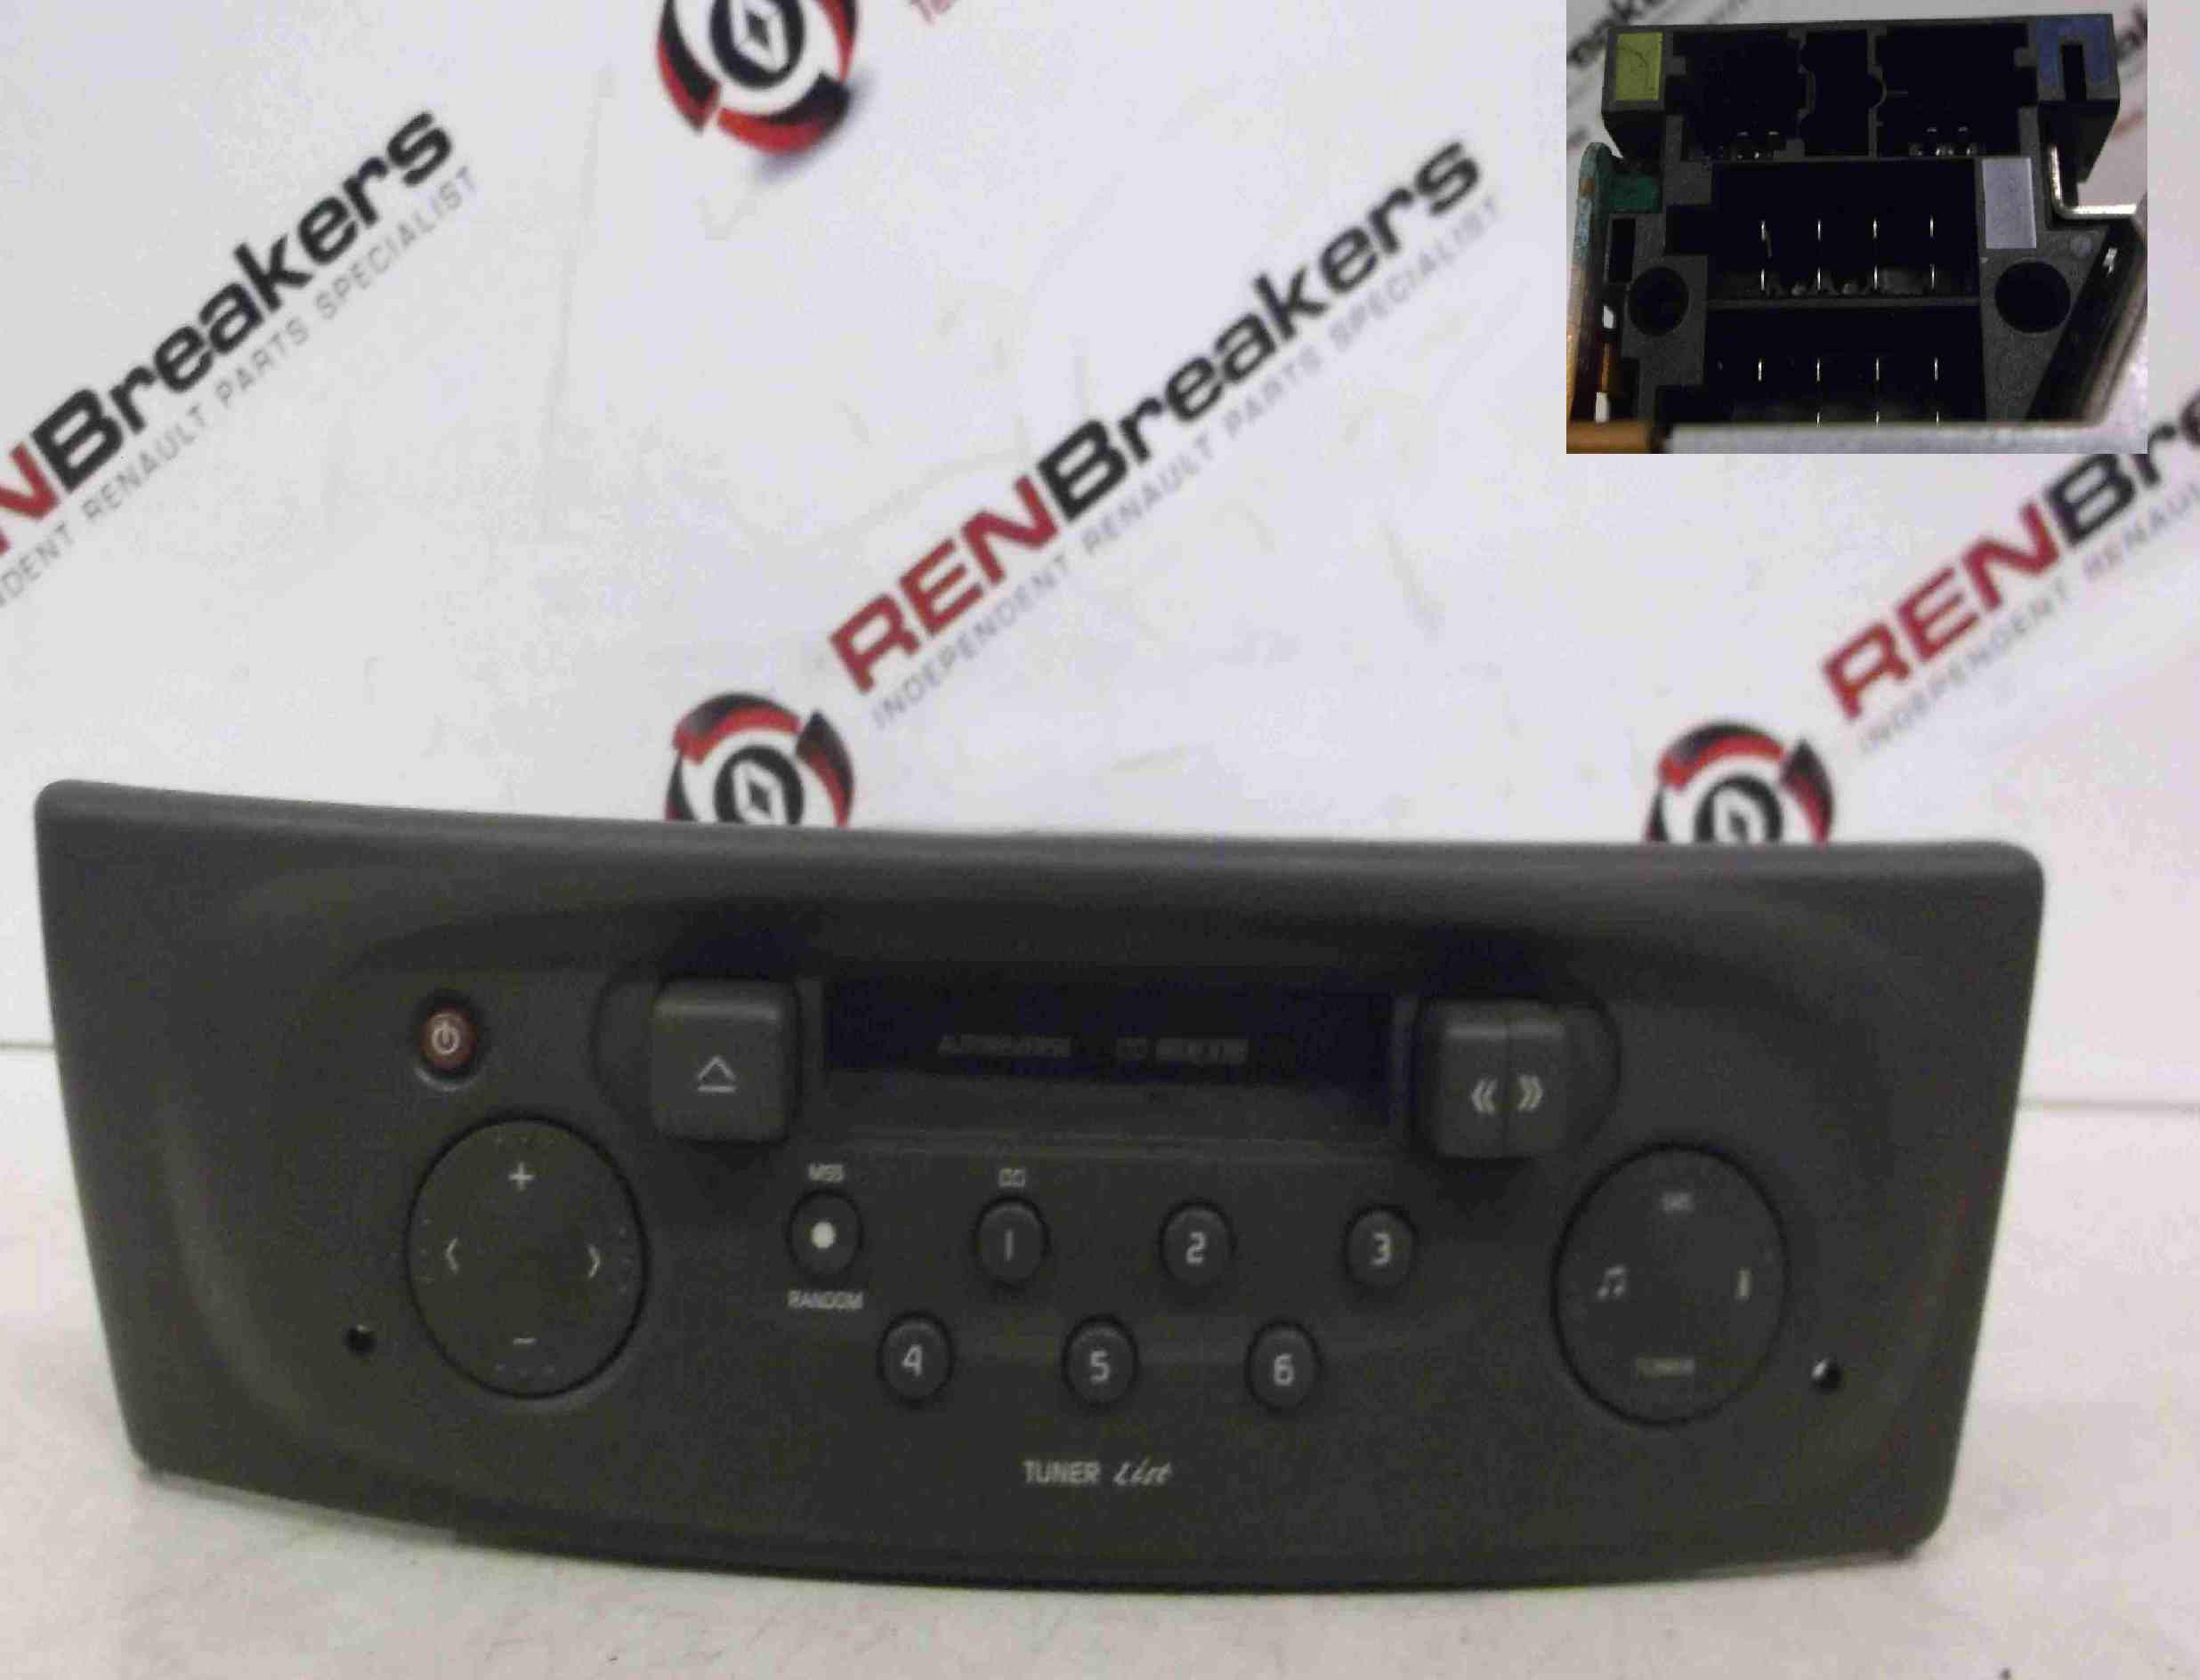 Renault Megane Scenic 1999-2003 Tape Casette Player Radio + Code 7700434422